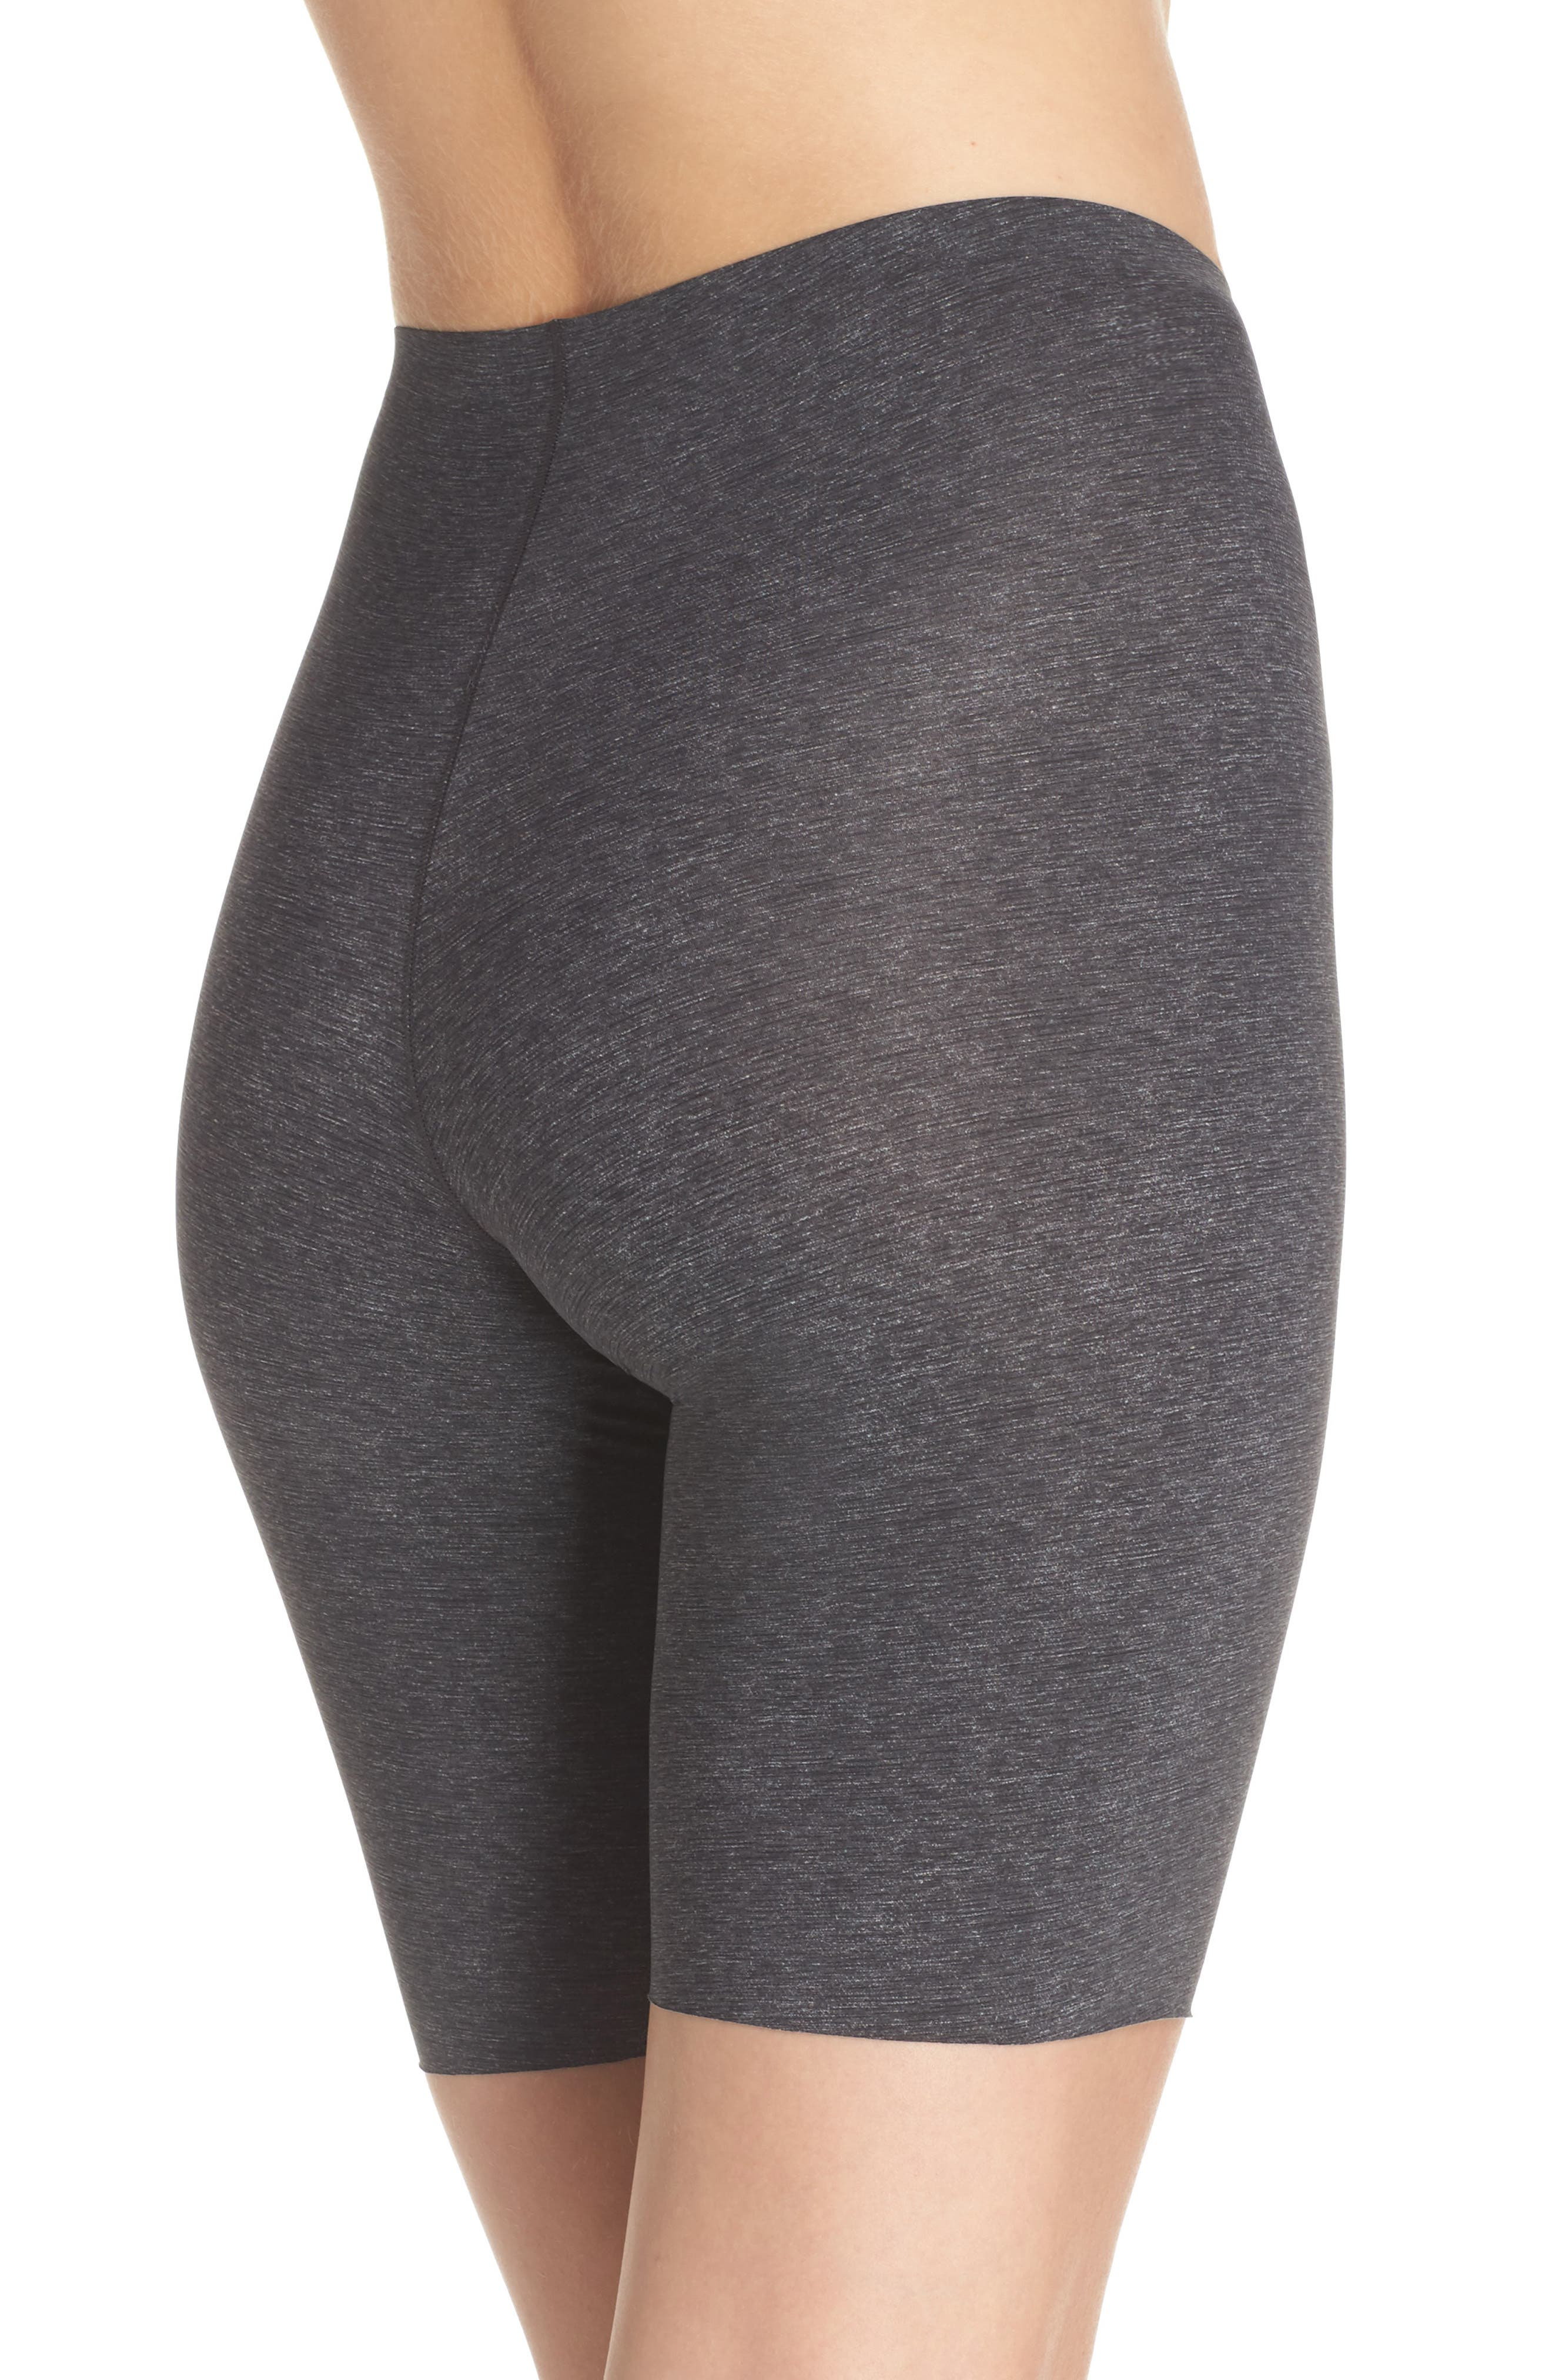 Alternate Image 2  - SPANX® Thinstincts Mid Thigh Shorts